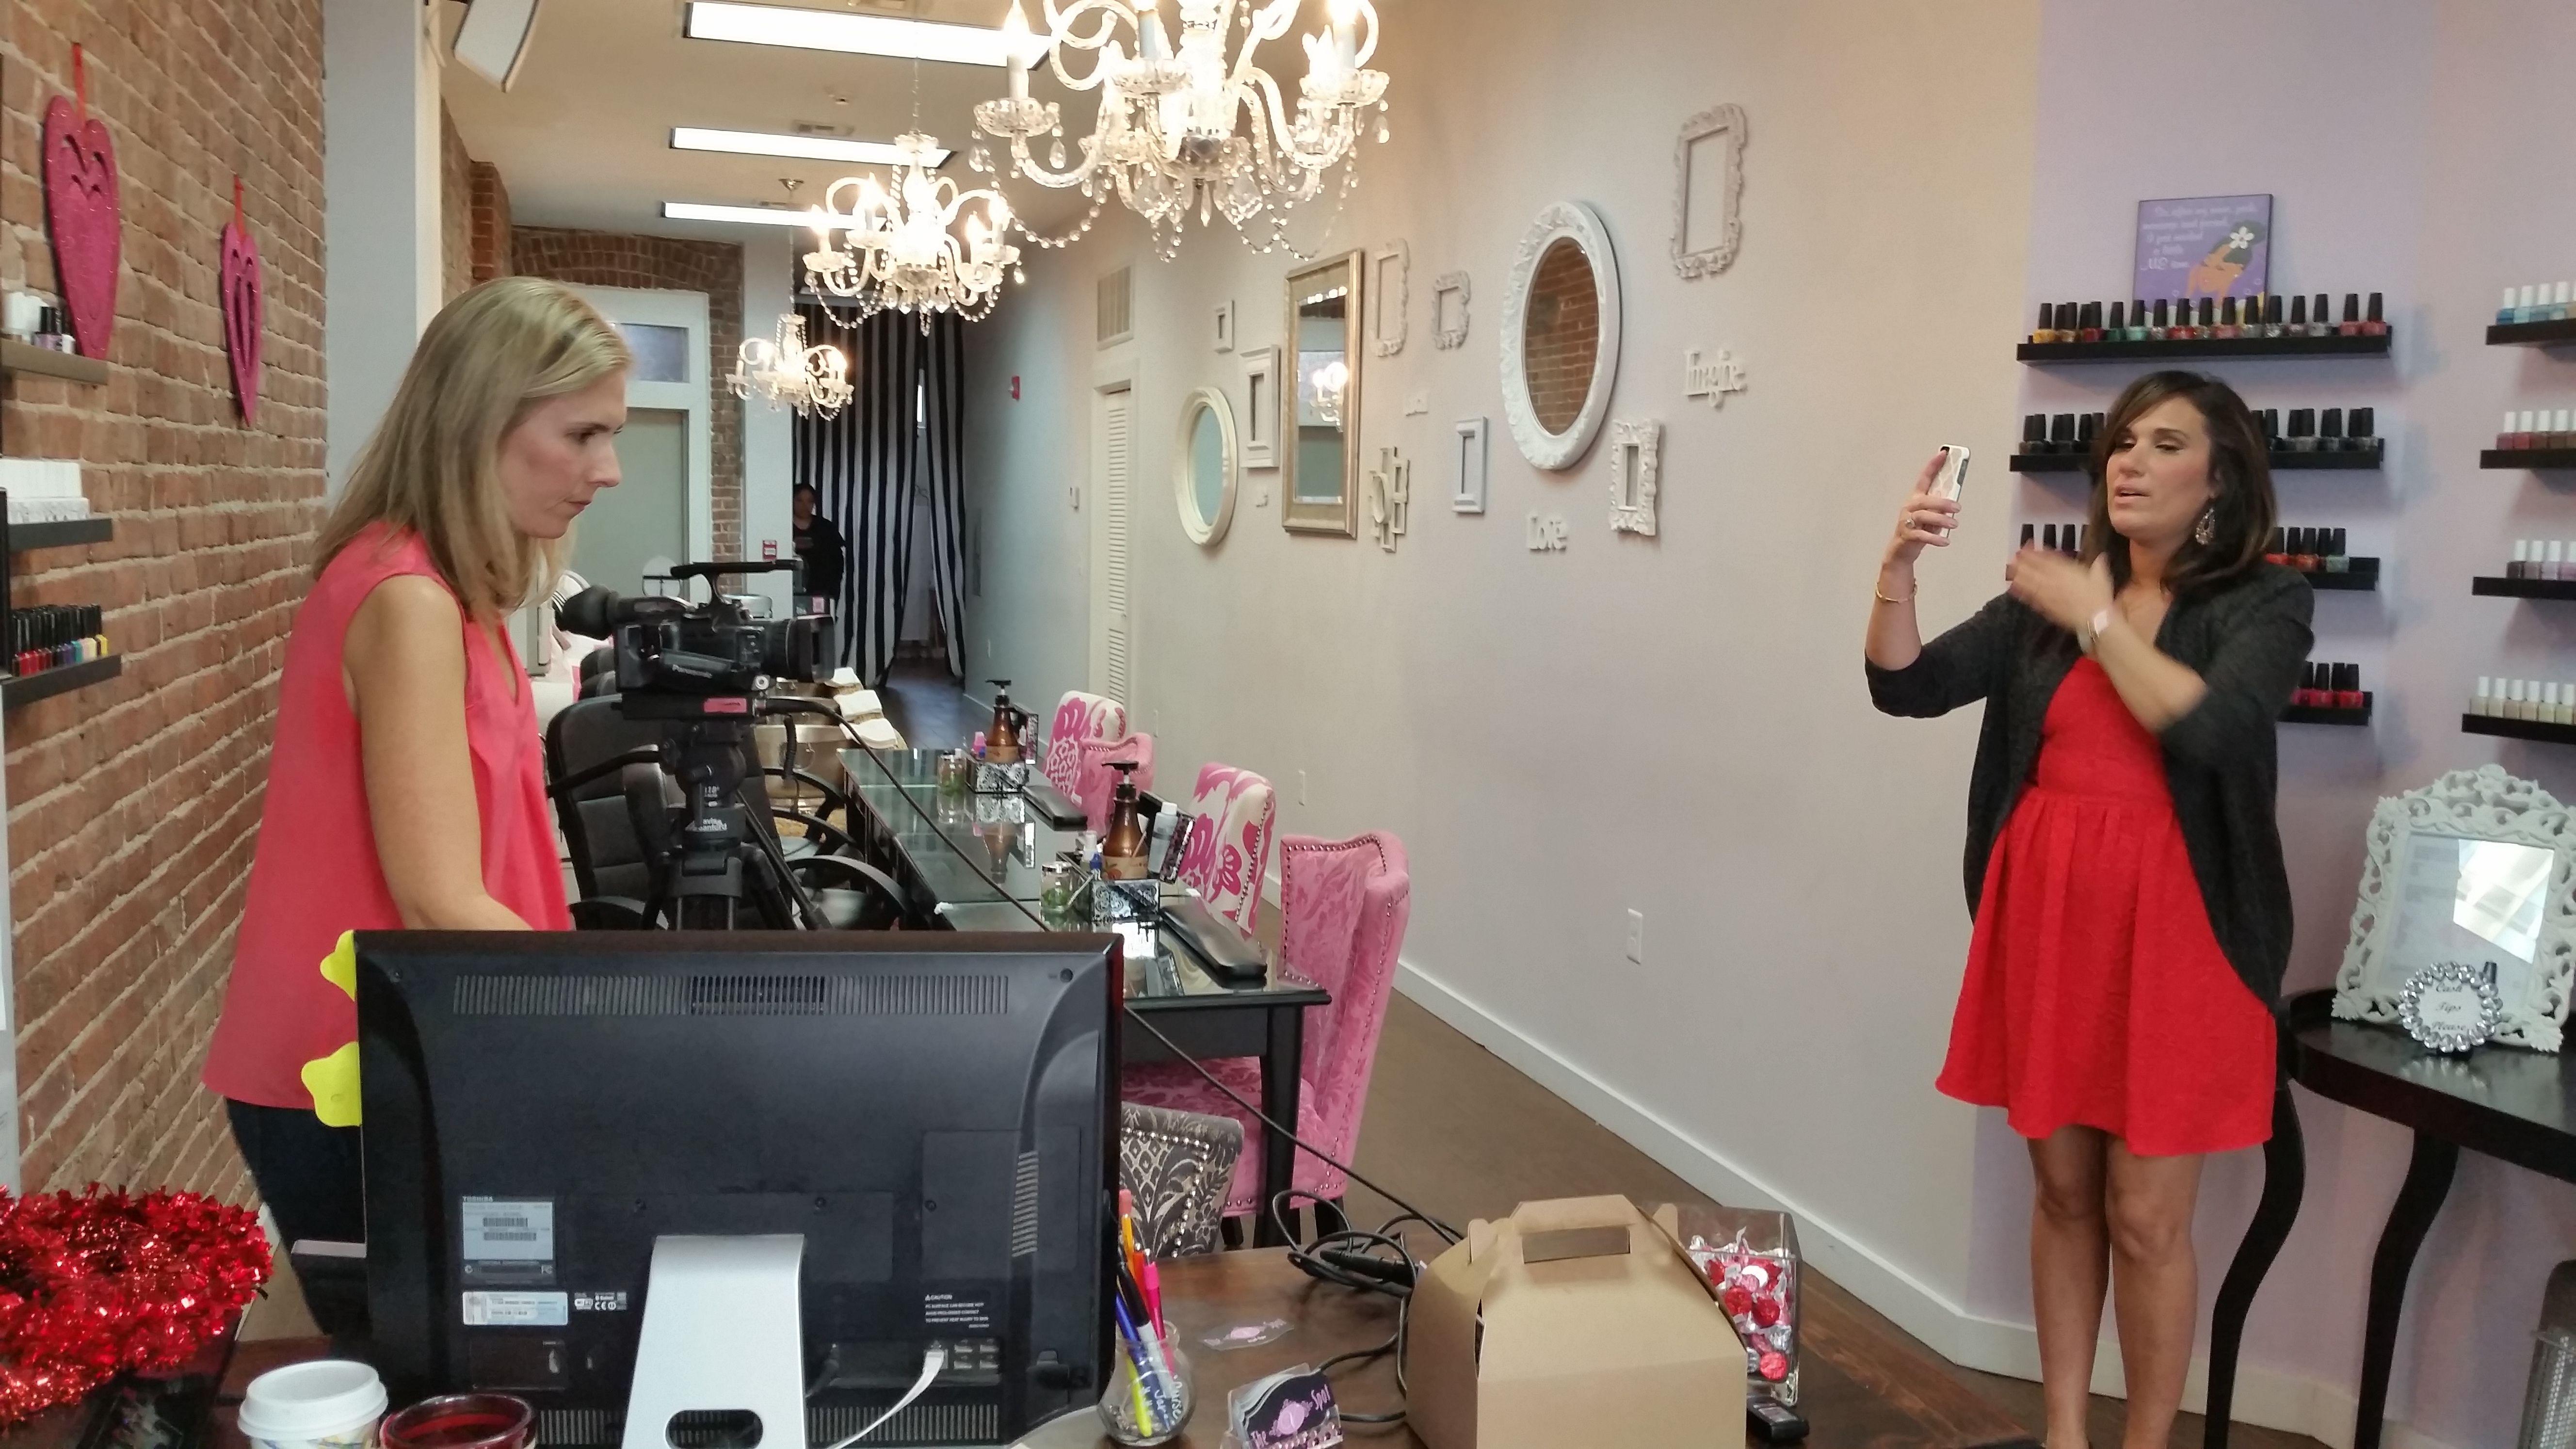 The Daily Fashionista at The V Spot Nail Spa Hoboken NJ